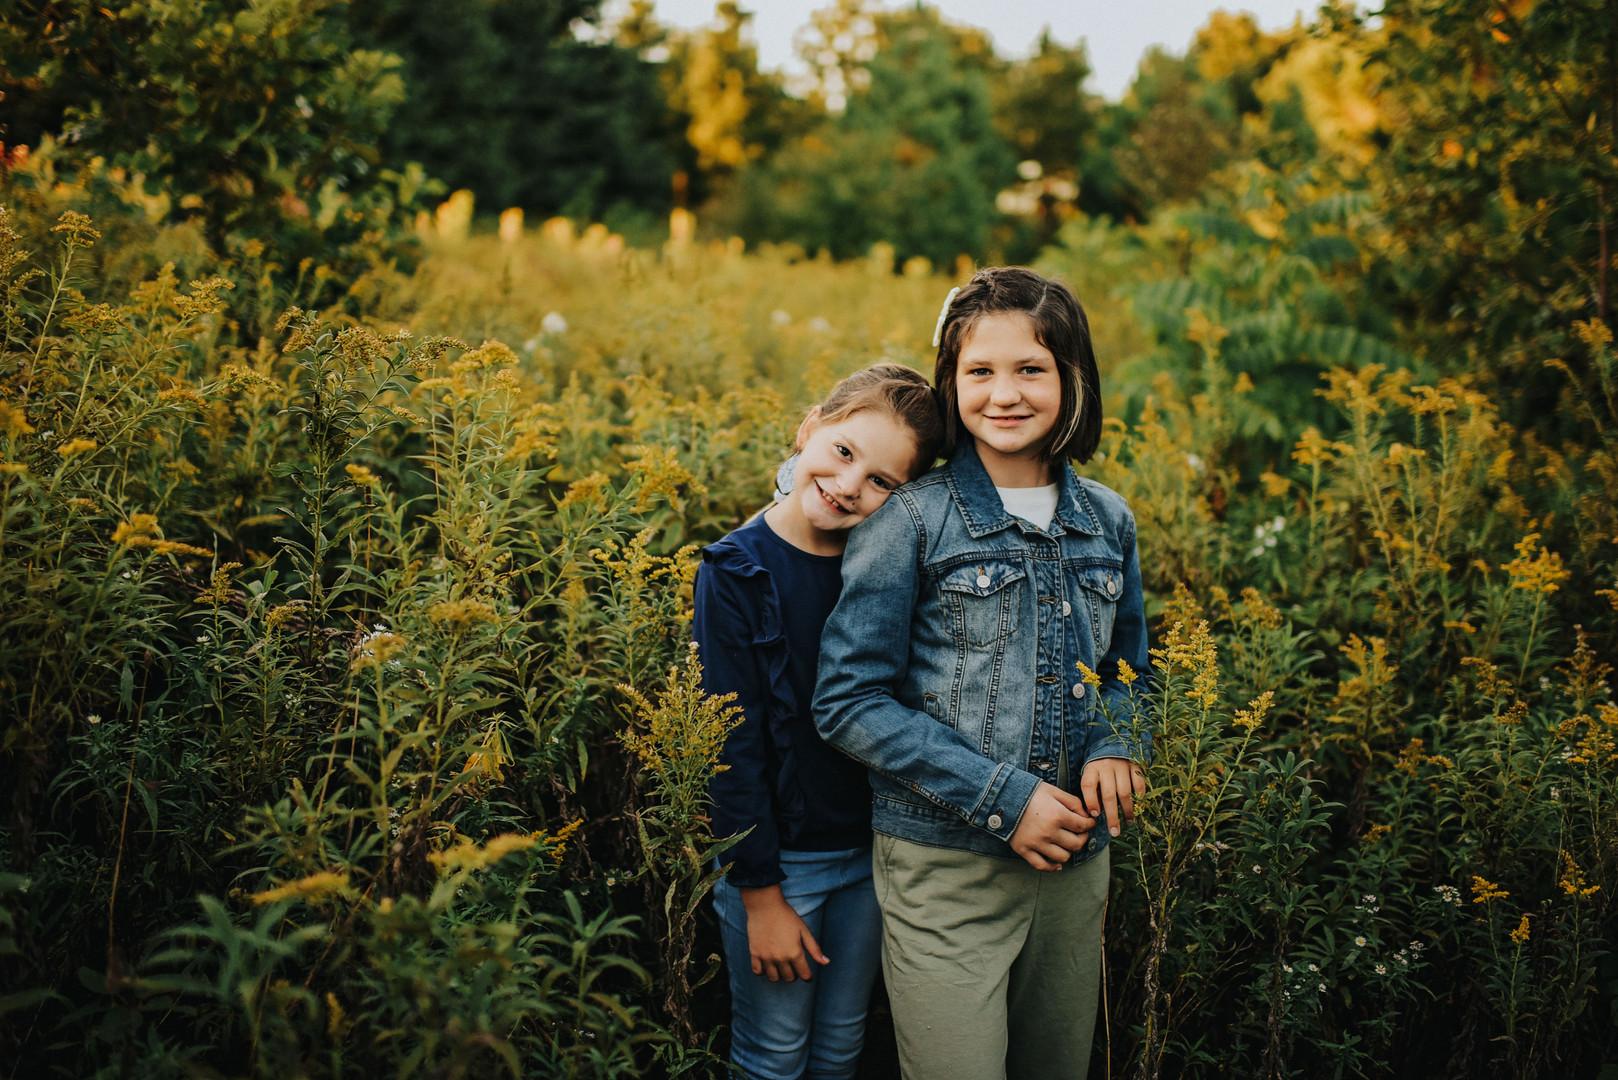 Whitehall Wisconsin Outdoor Unposed Lifestyle Family Photographer